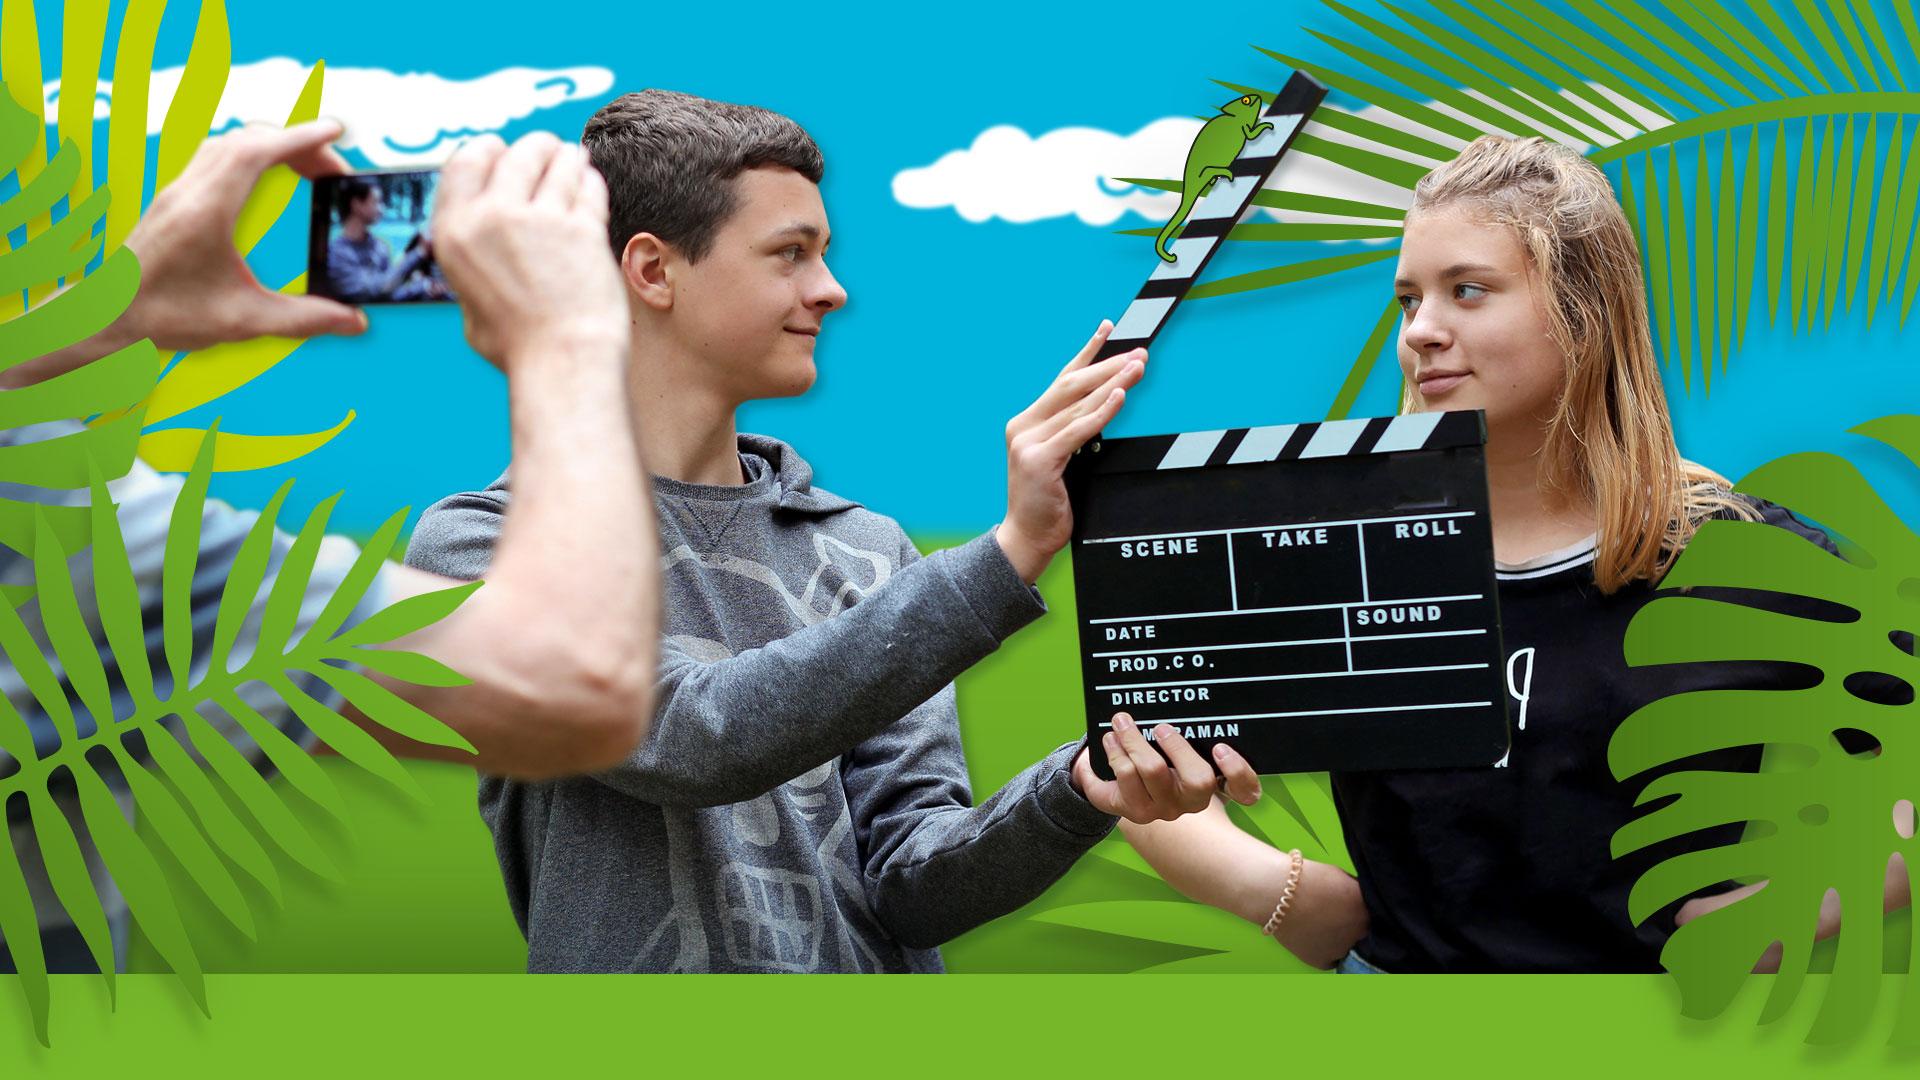 Smart-Film-Safari-Drehteam-Dschungel-gruen